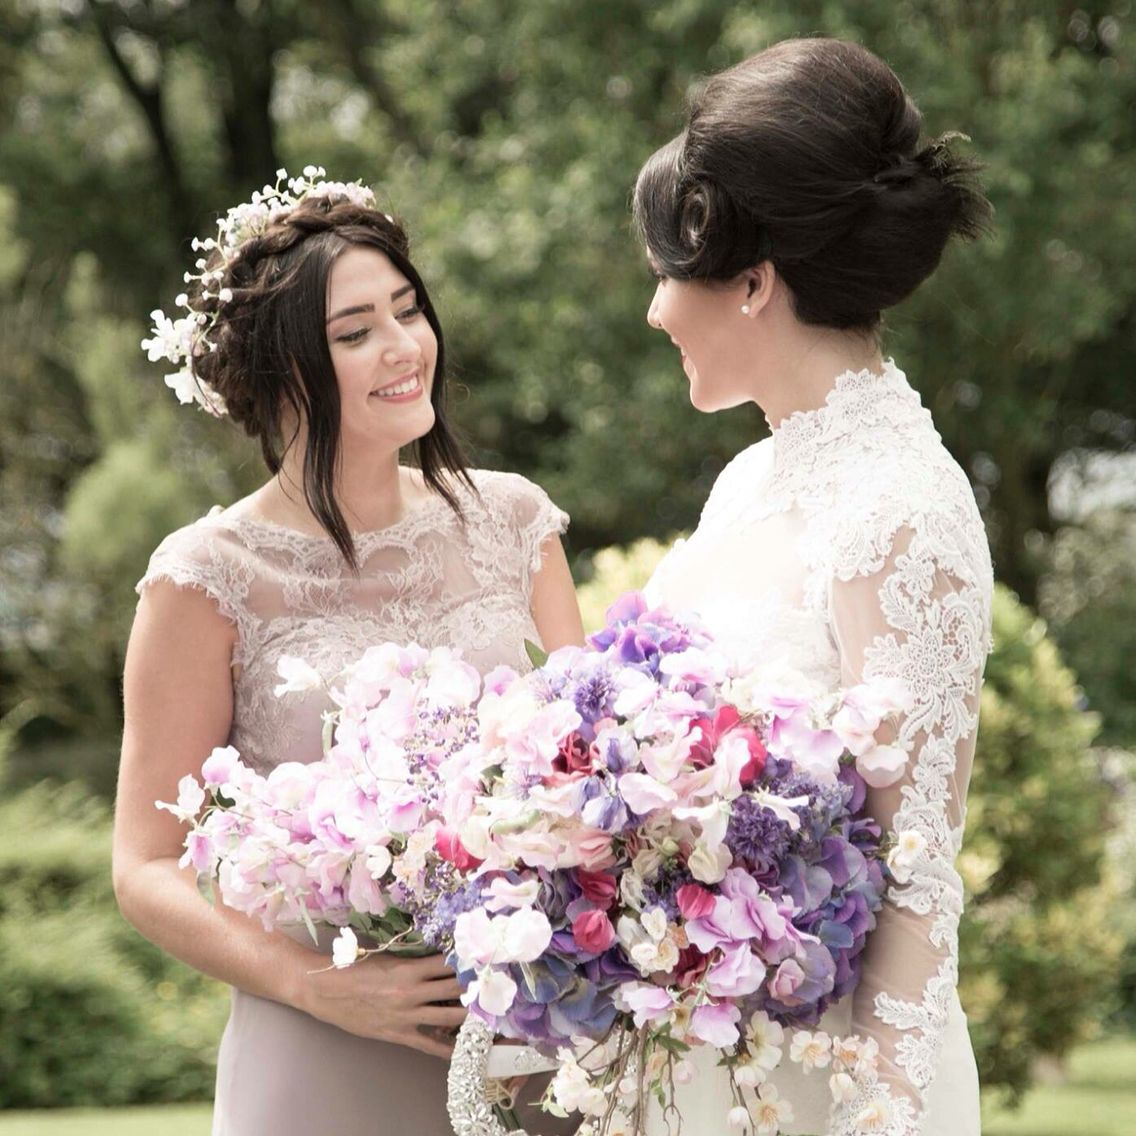 Artificial Sweet Peas Hydrangeas Peonies And Blossom Wedding